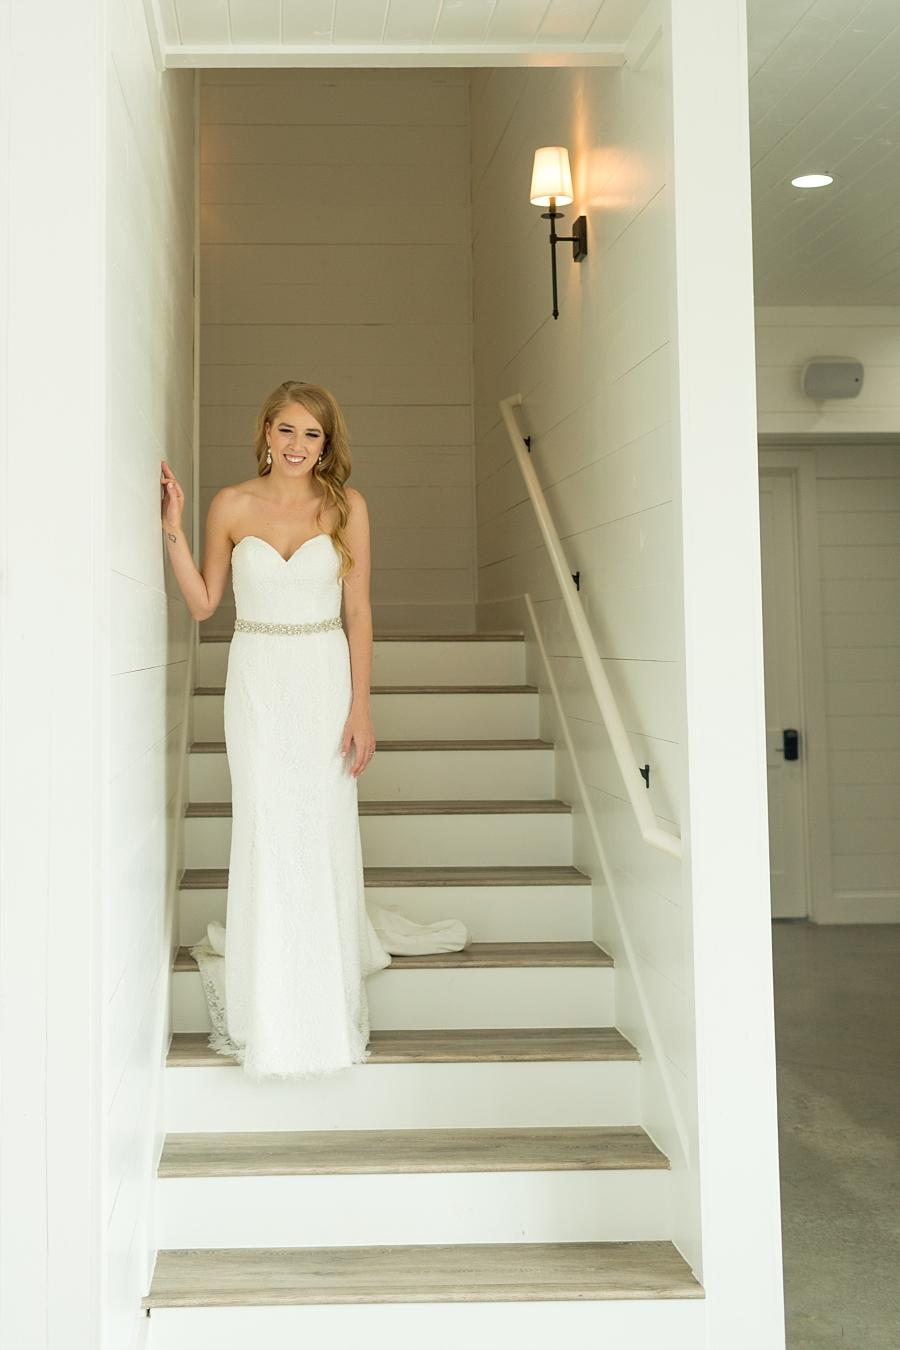 Stacy-Anderson-Photography-The-Farmhouse-Houston-Wedding-Photographer_0068.jpg